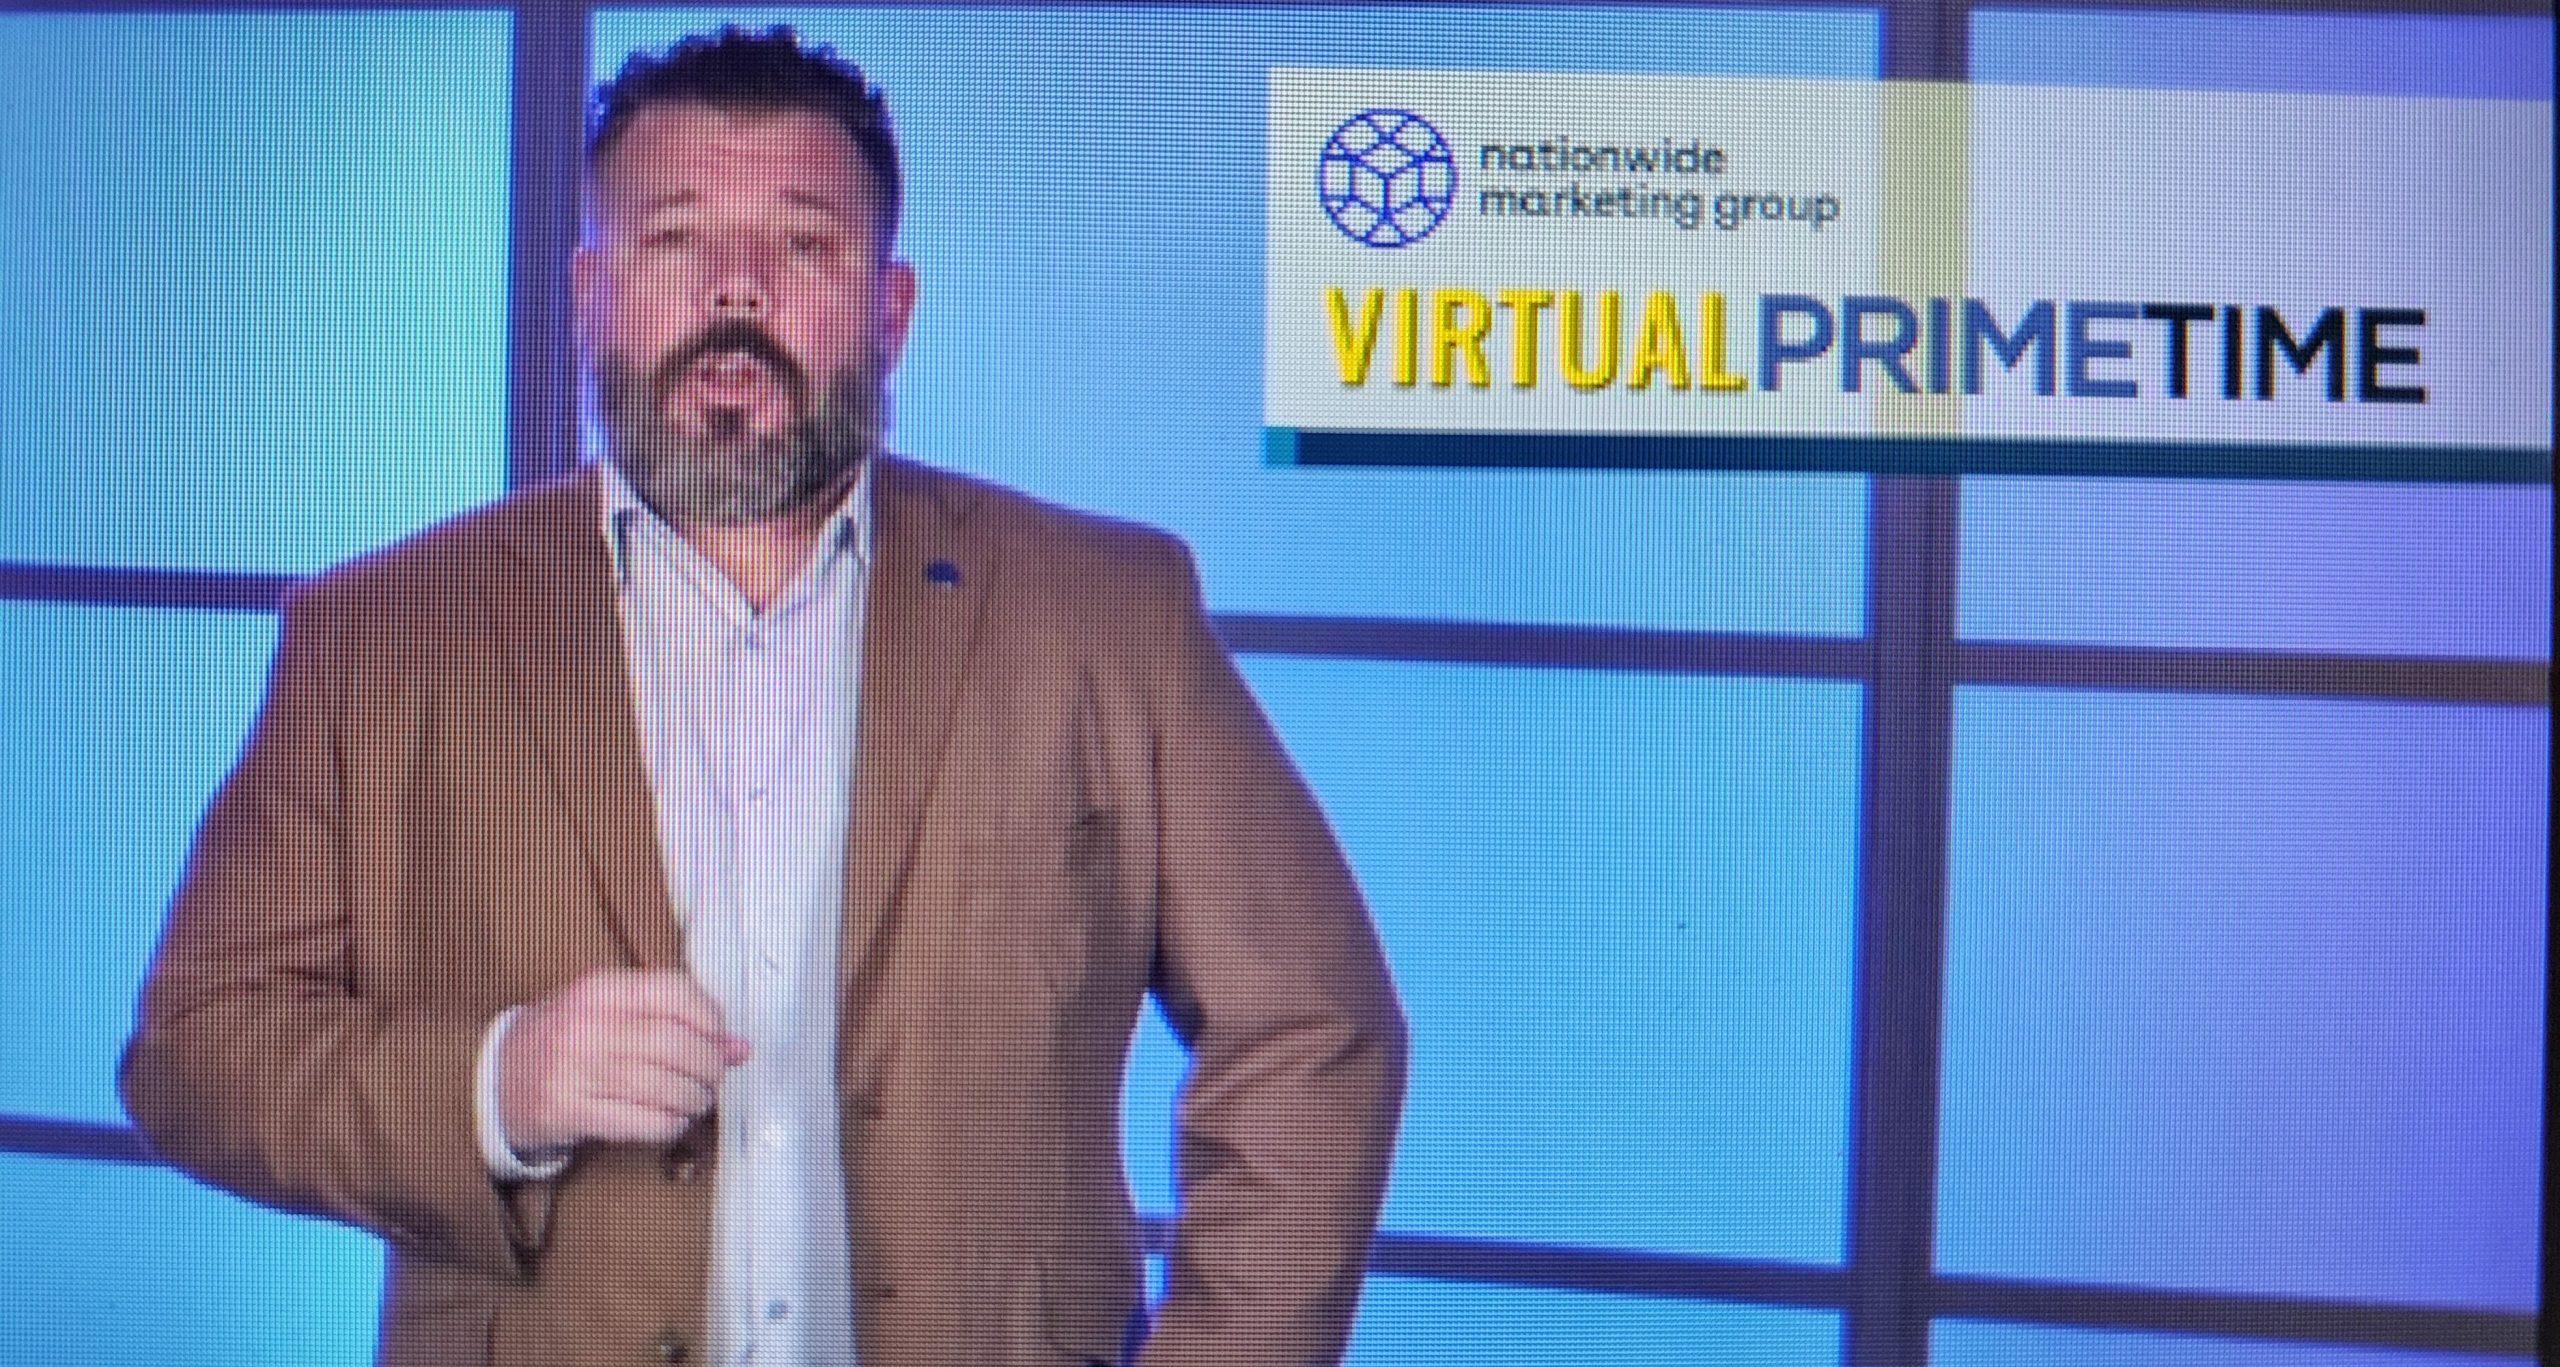 Nationwide President Tom Hickman Virtual PrimeTime Speech